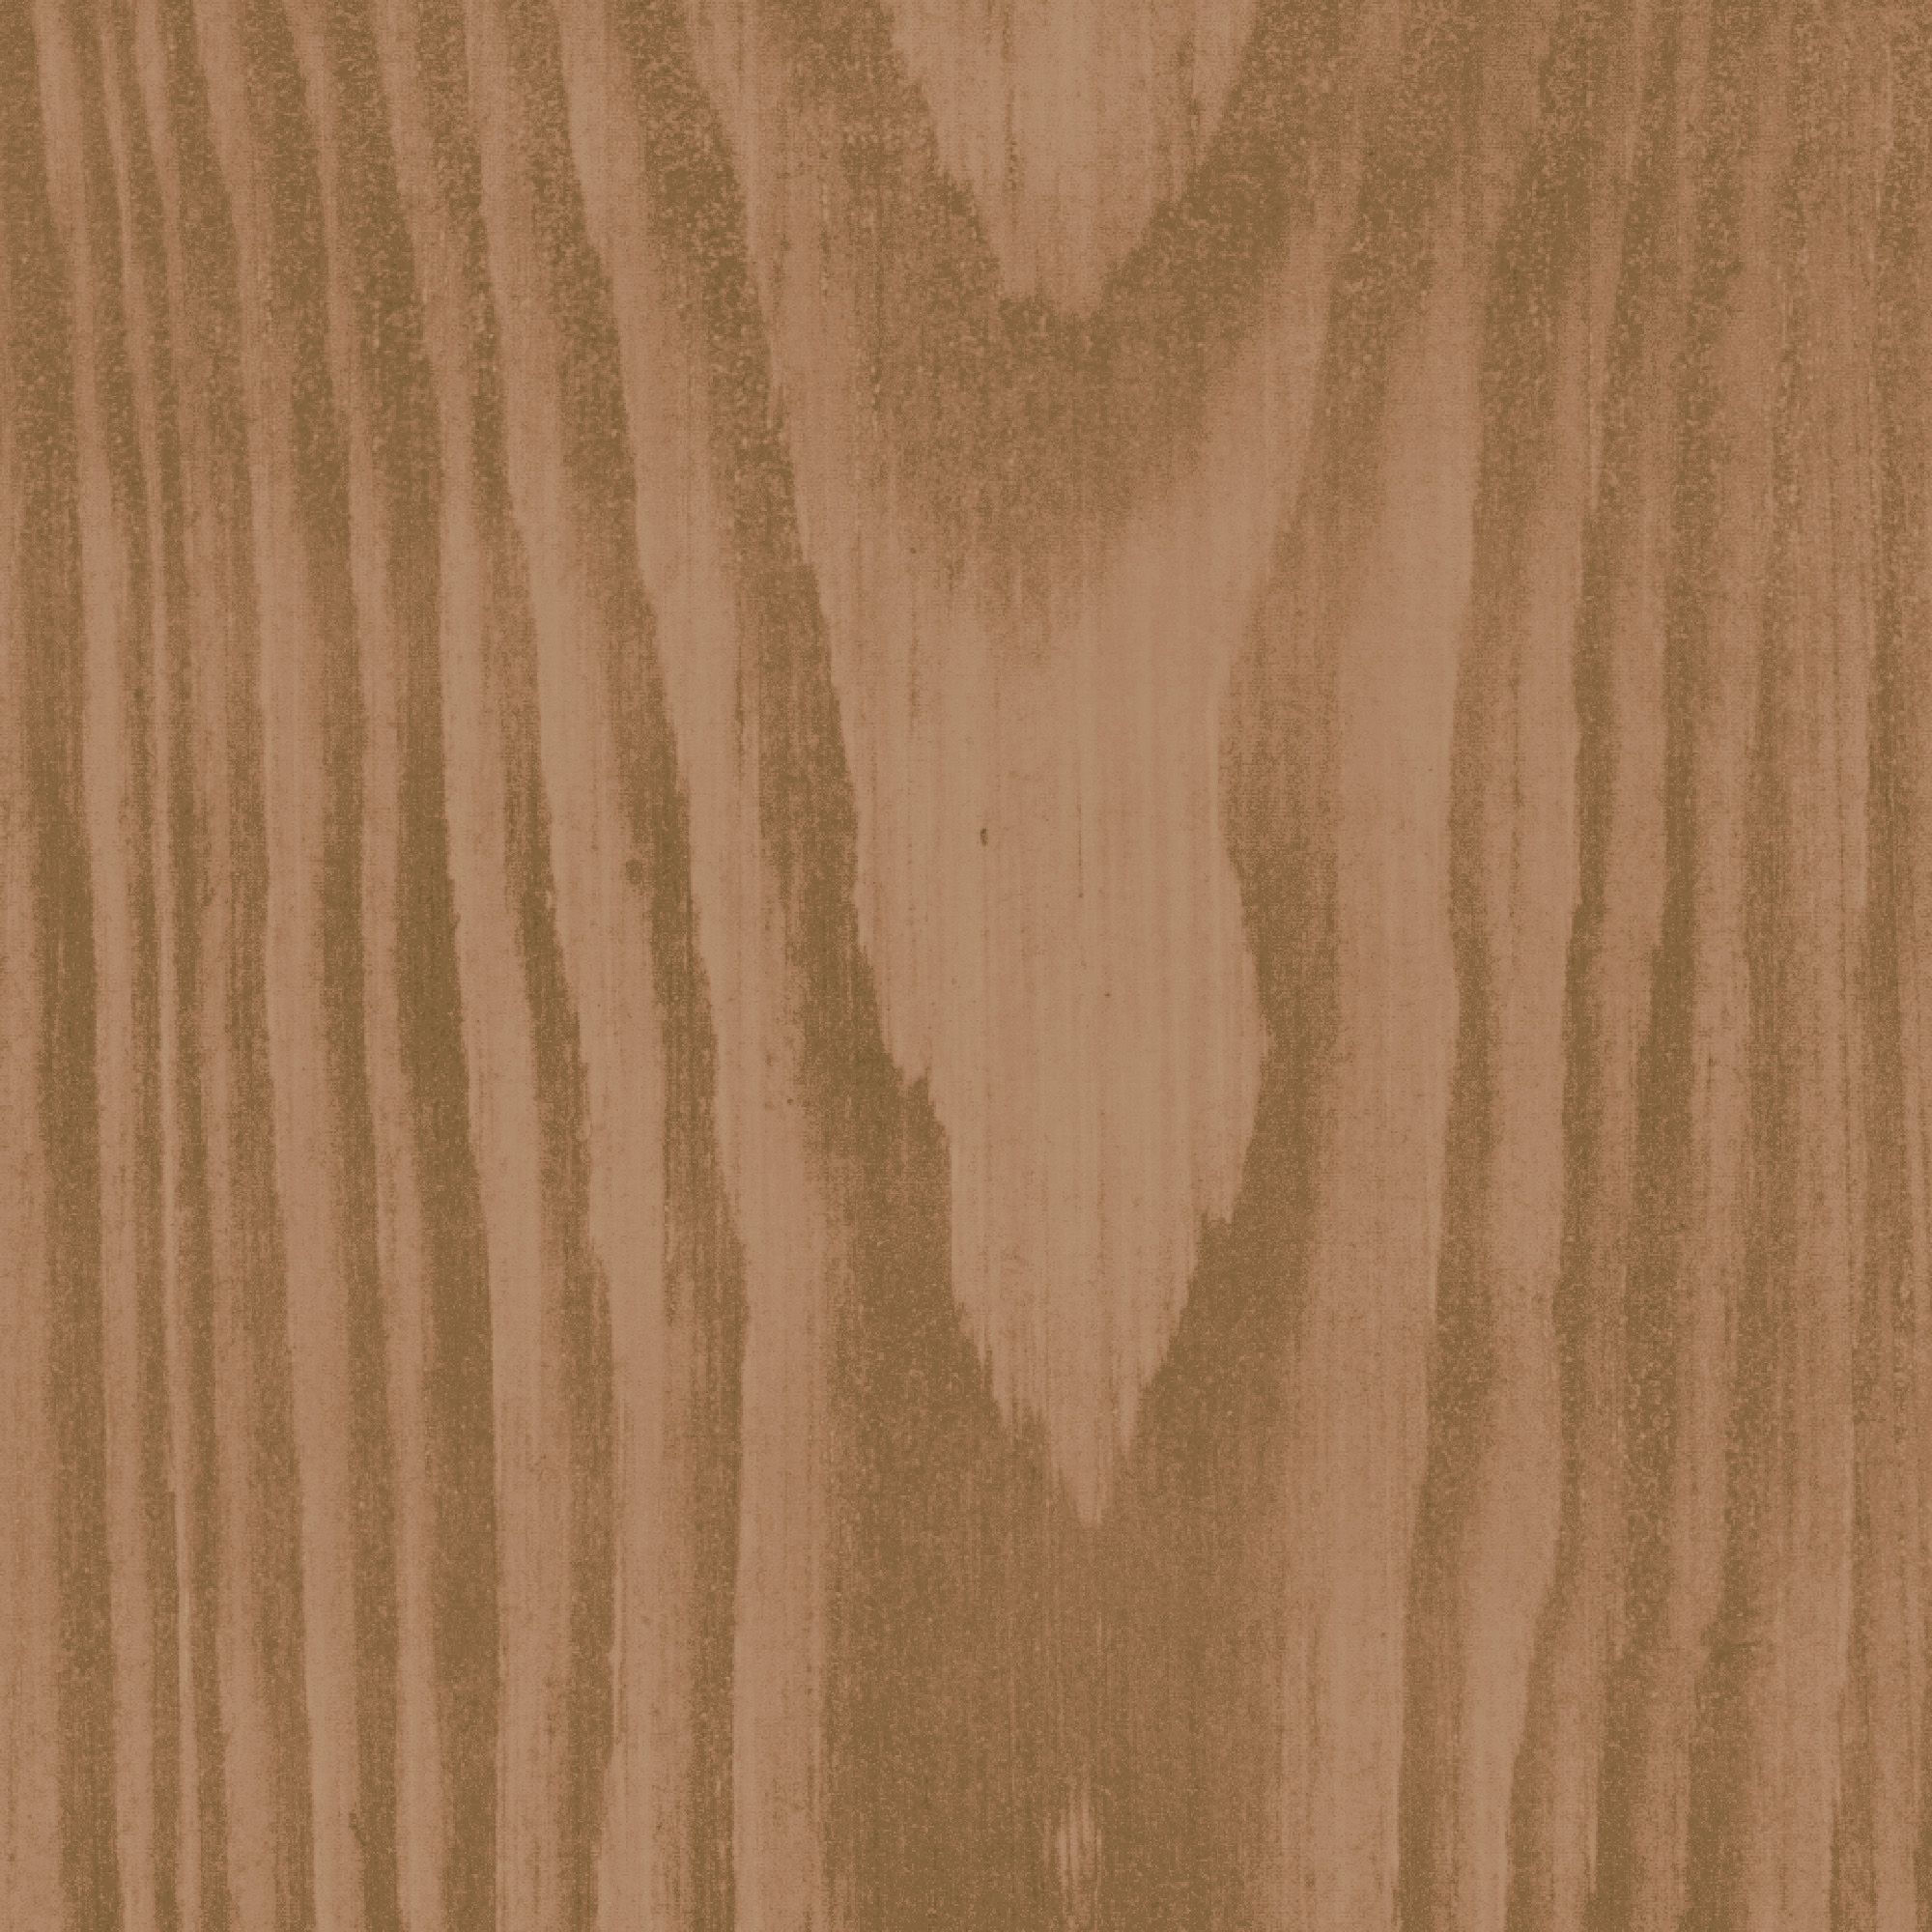 Ronseal Diamond Hard French Oak Satin Interior Varnish 0.25l